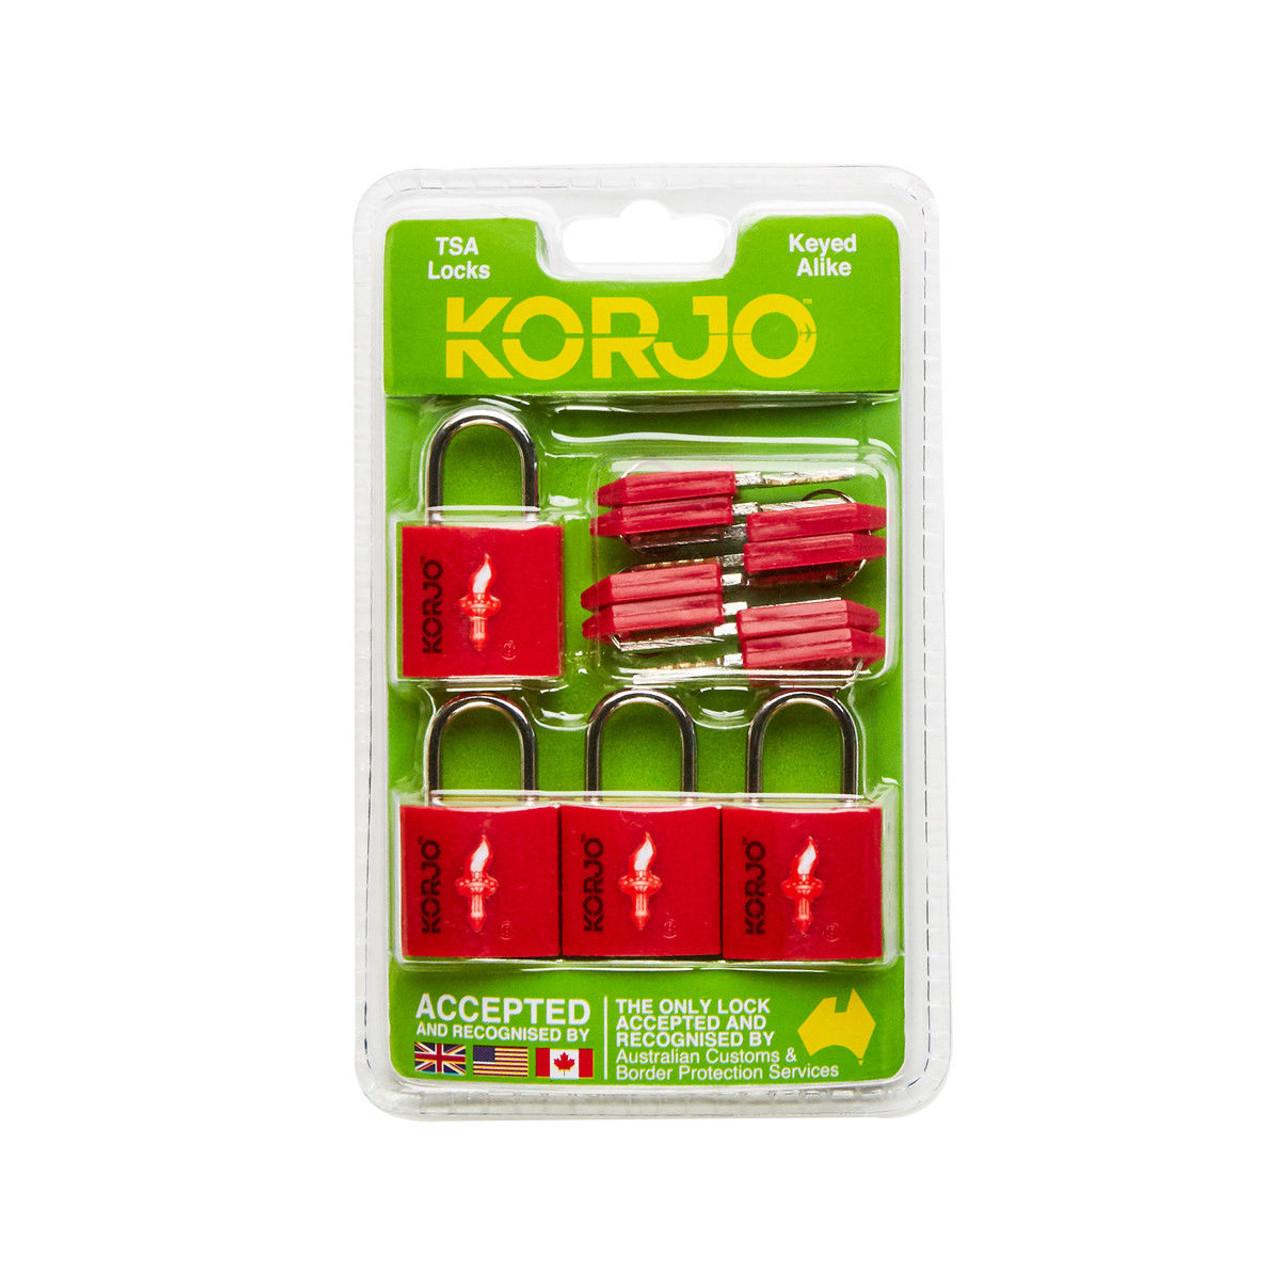 Korjo TSALL4 TSA Keyed Locks 4 Pack - Red